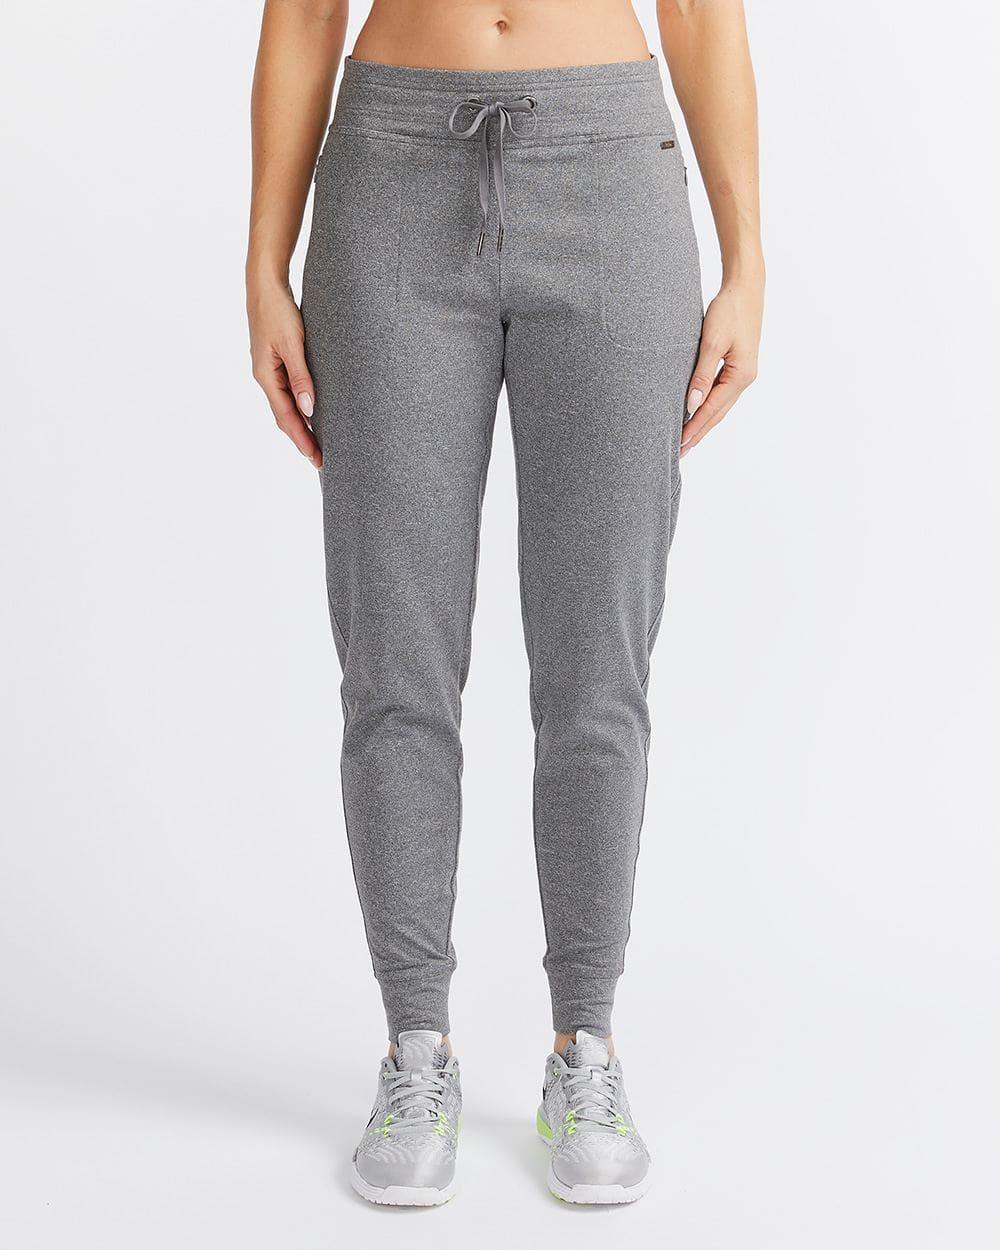 Hyba Warm Jogger Pants